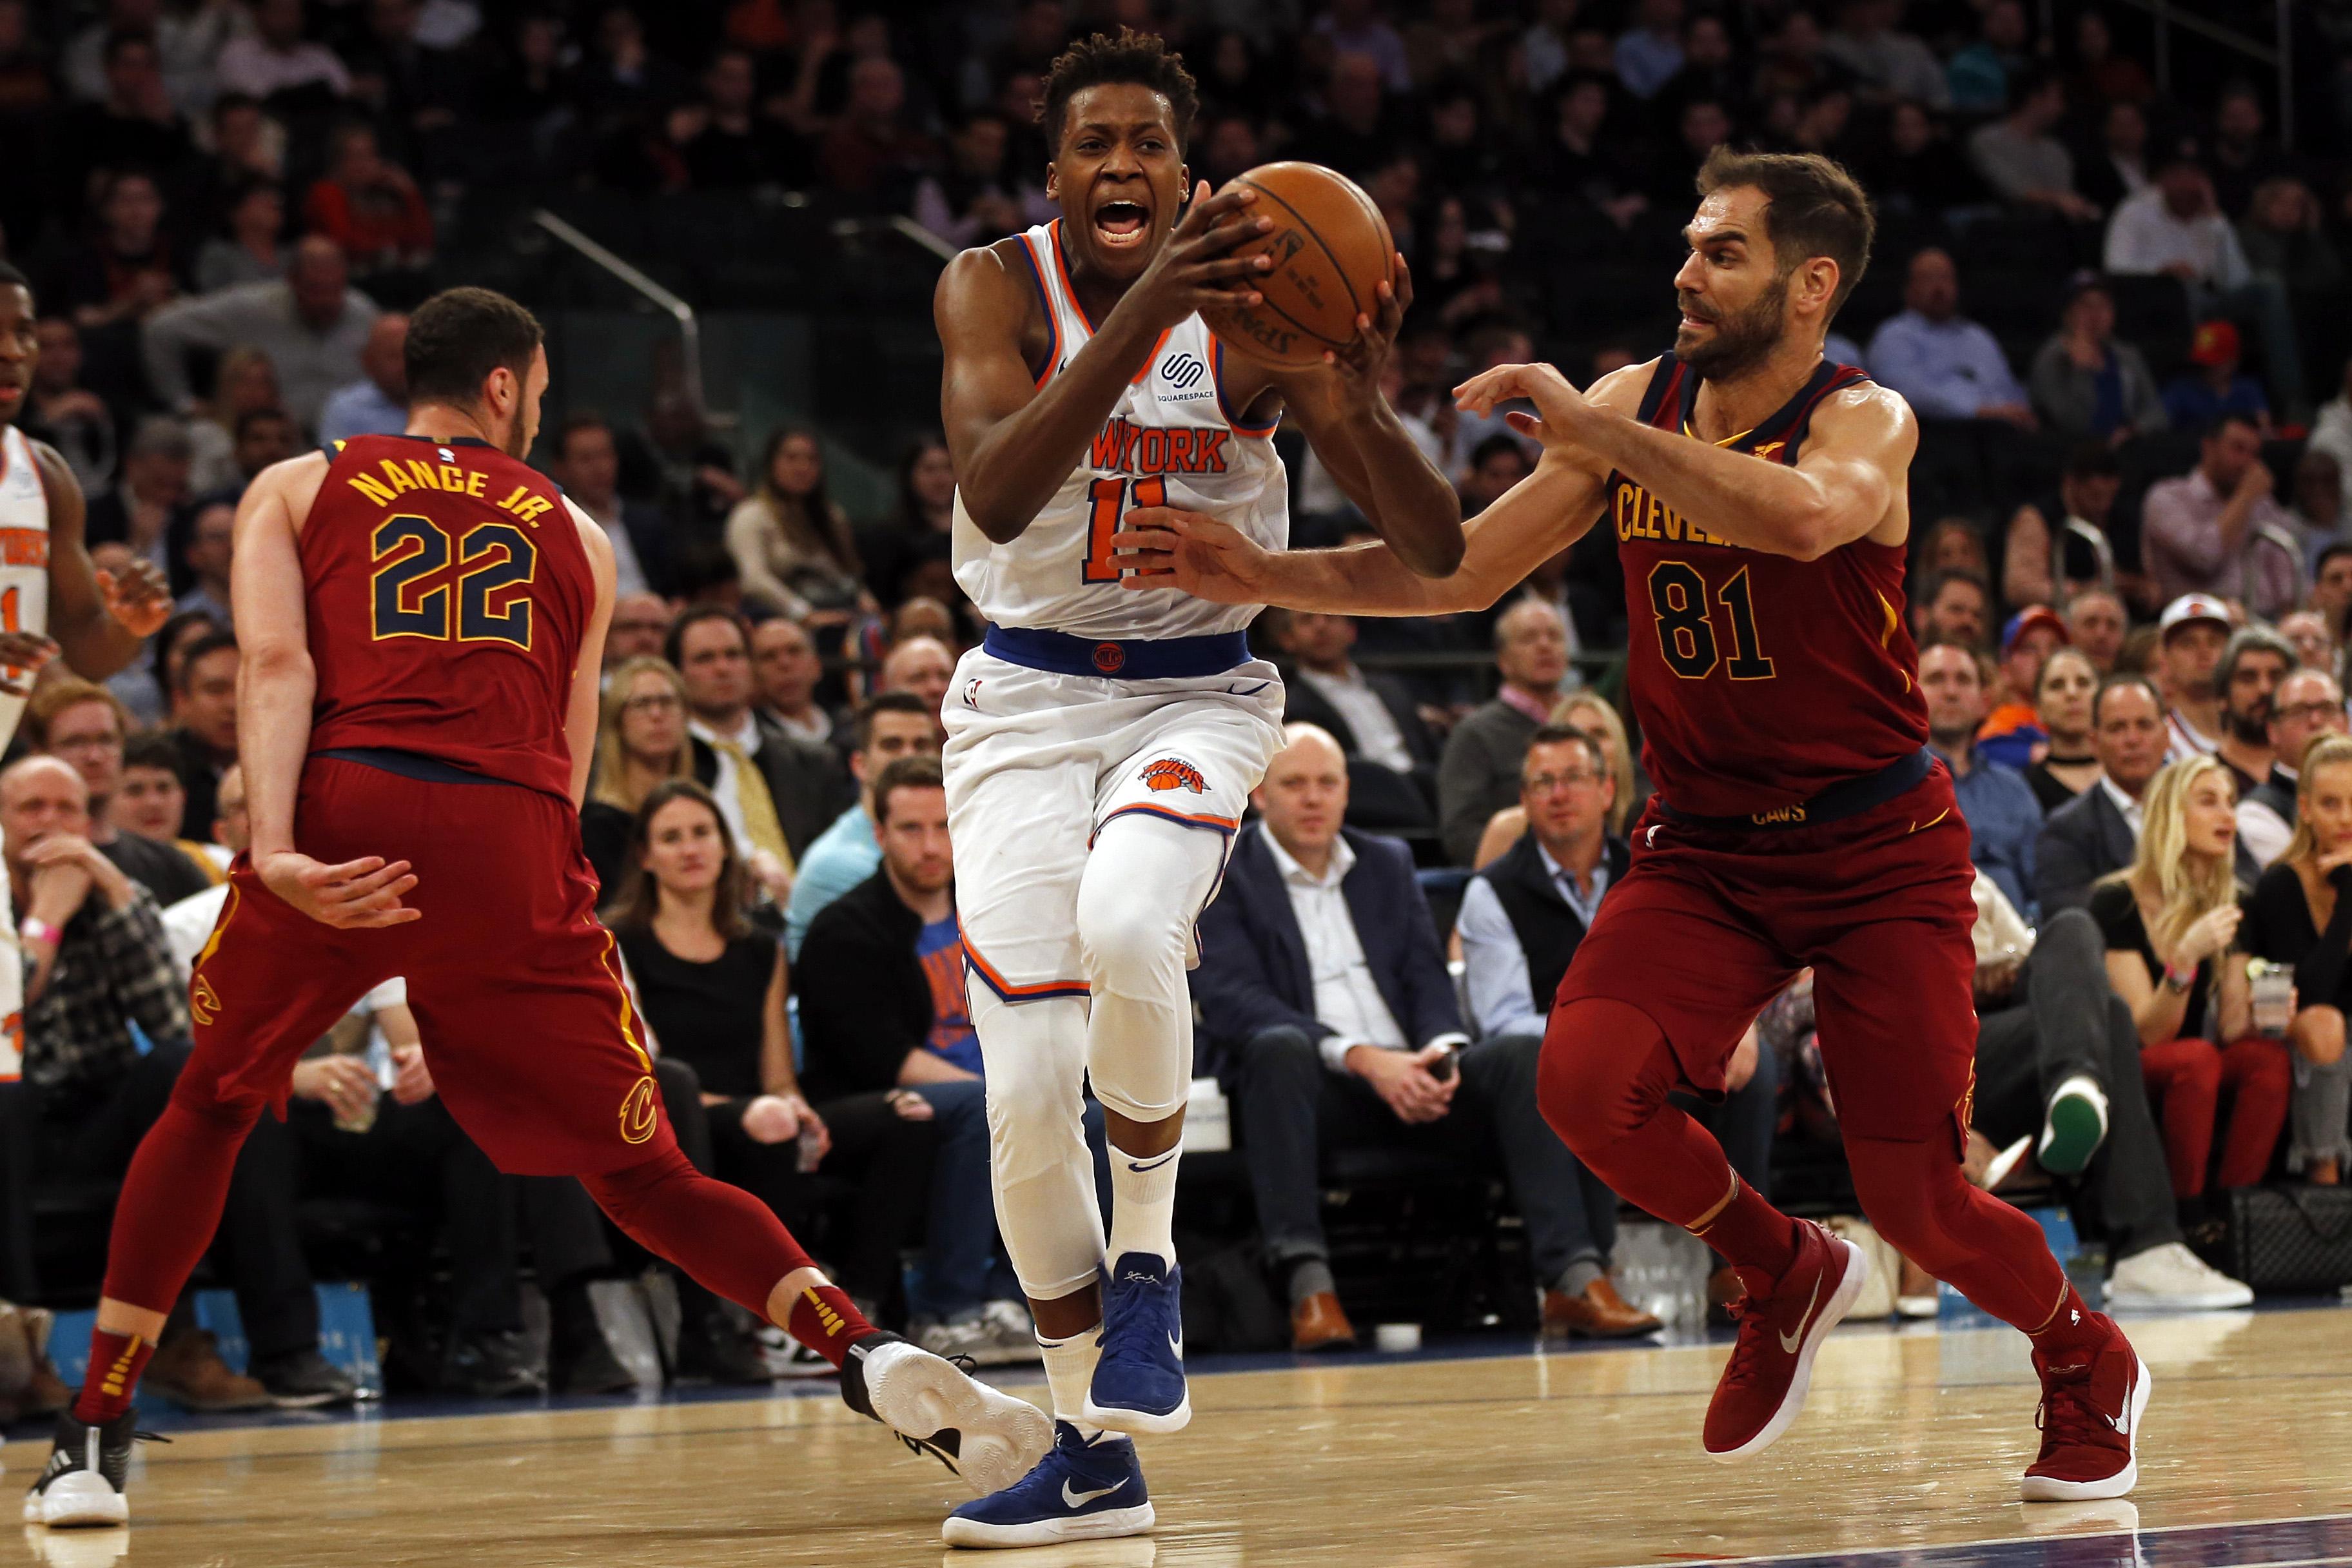 Frank Ntilikina scores career-high, impresses LeBron James in Knicks' loss